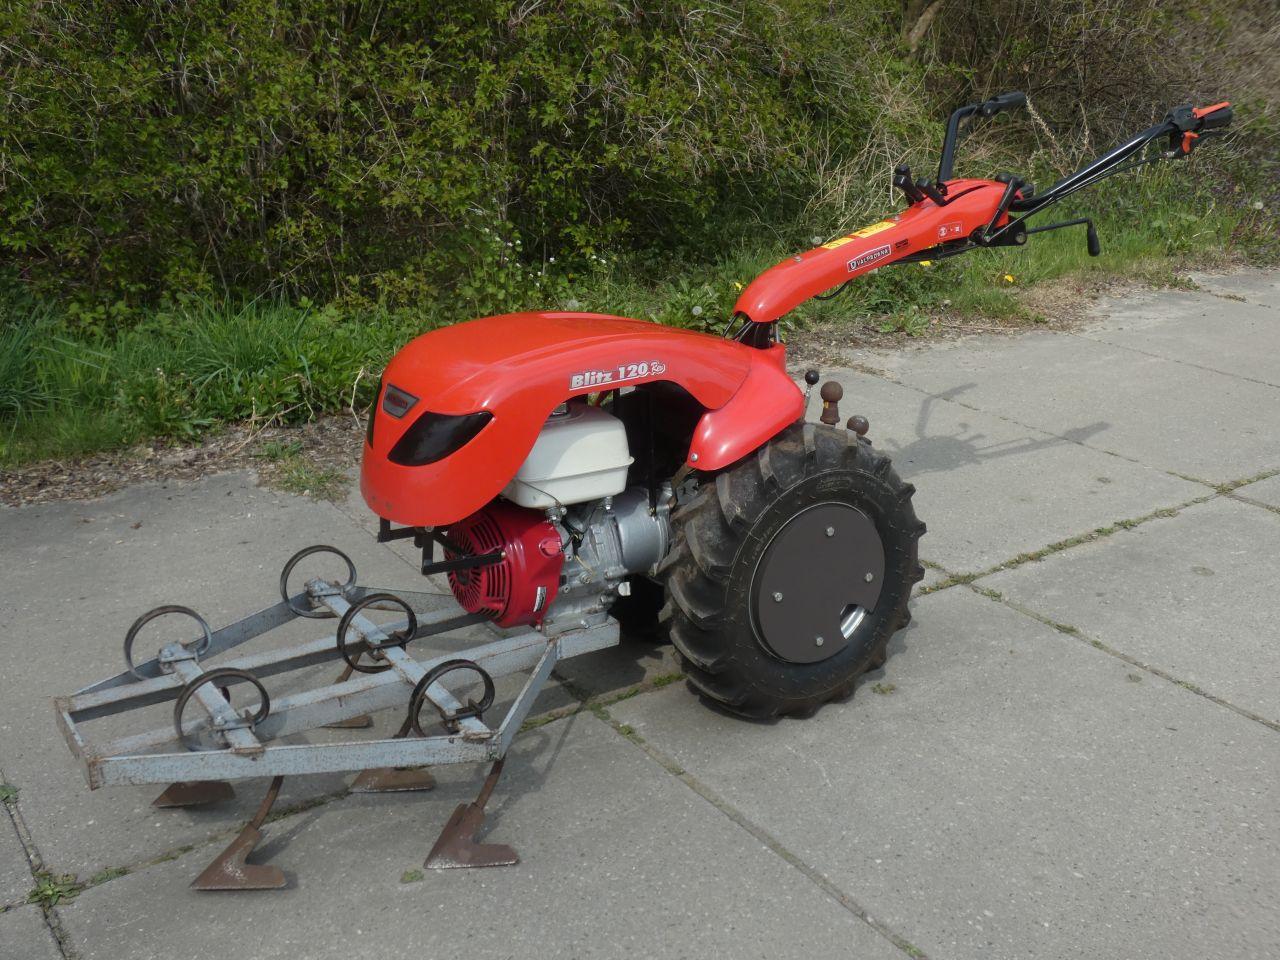 VALPADANA tuinfrees (type BLITZ REV 120, Honda GX motor)